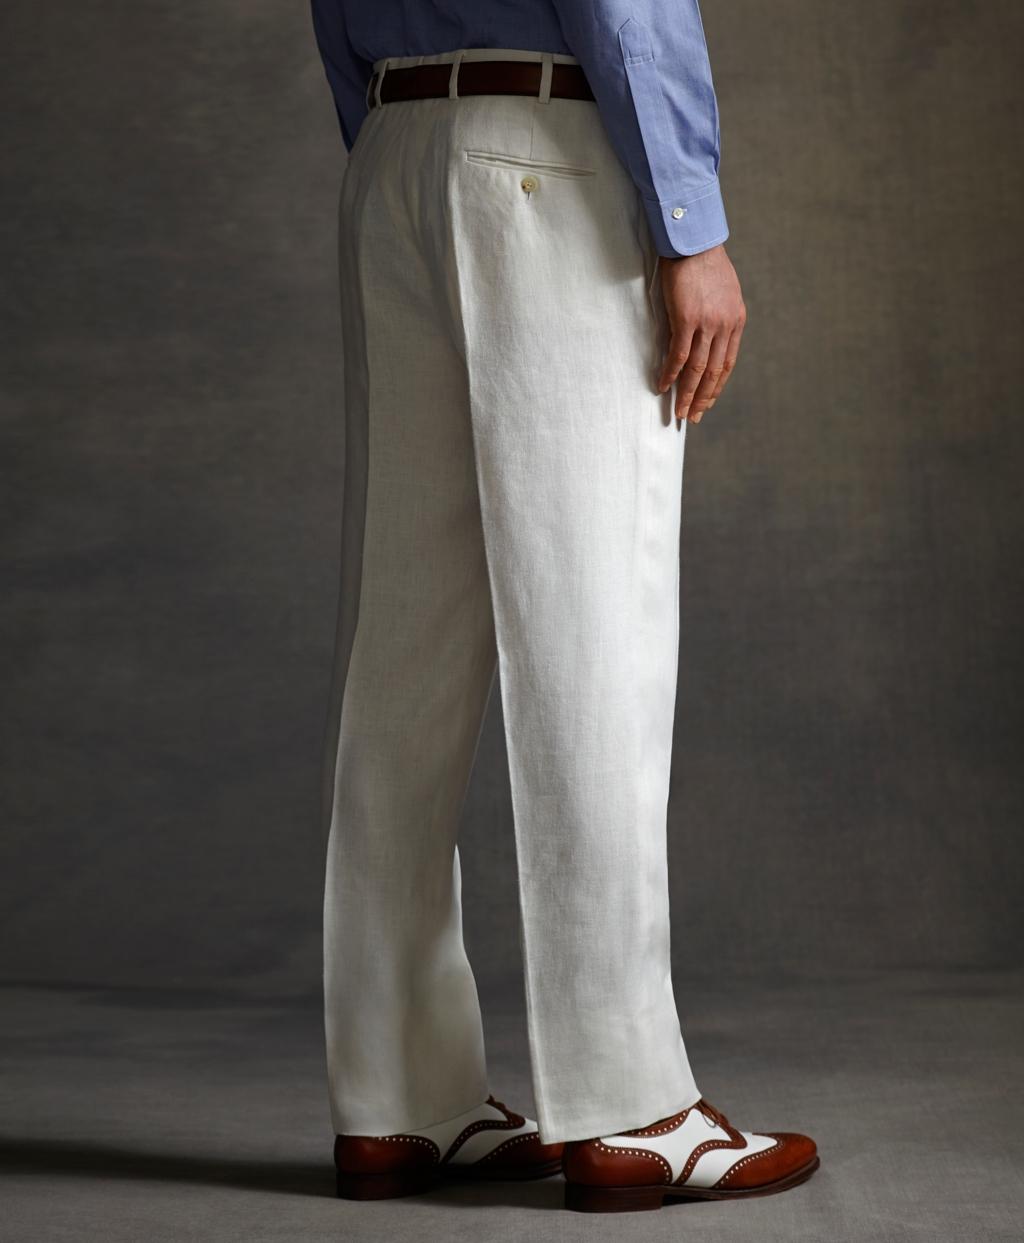 Jean Paul Gaultier Men Clothing